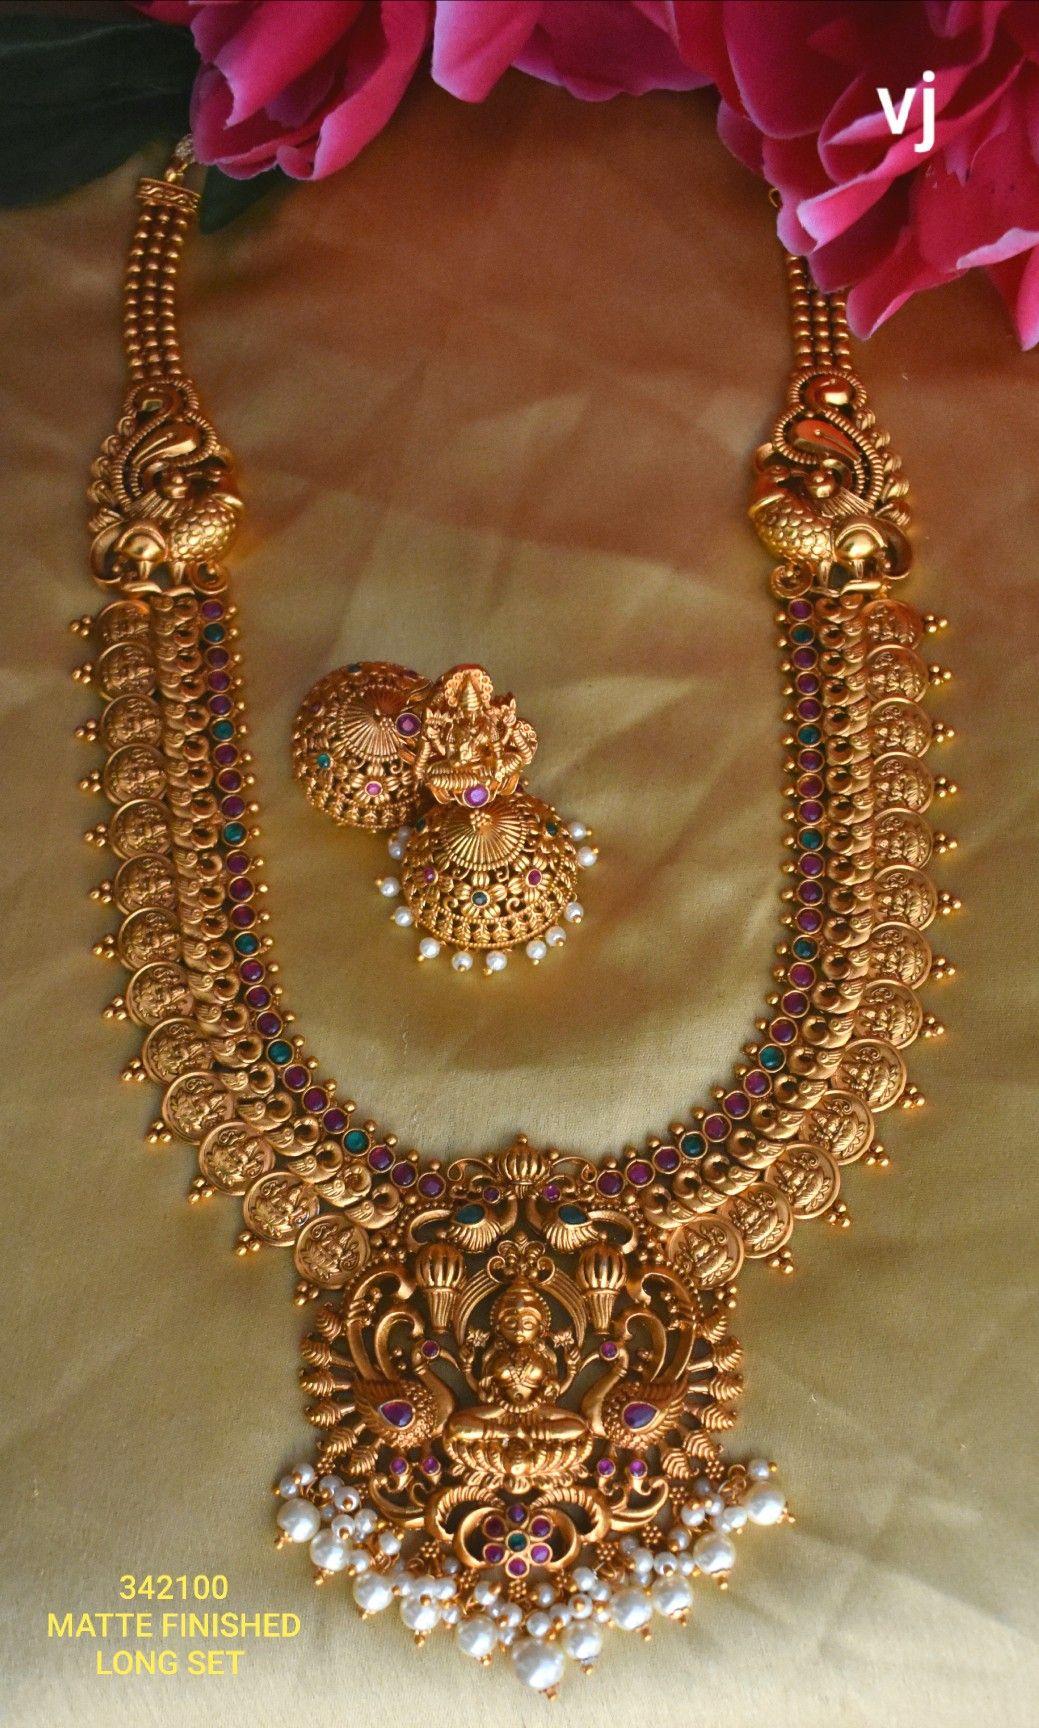 Pin By Selvi D On Imitation Jewellery Bridal Gold Jewellery Antique Jewelry Indian Gold Jewelry Fashion